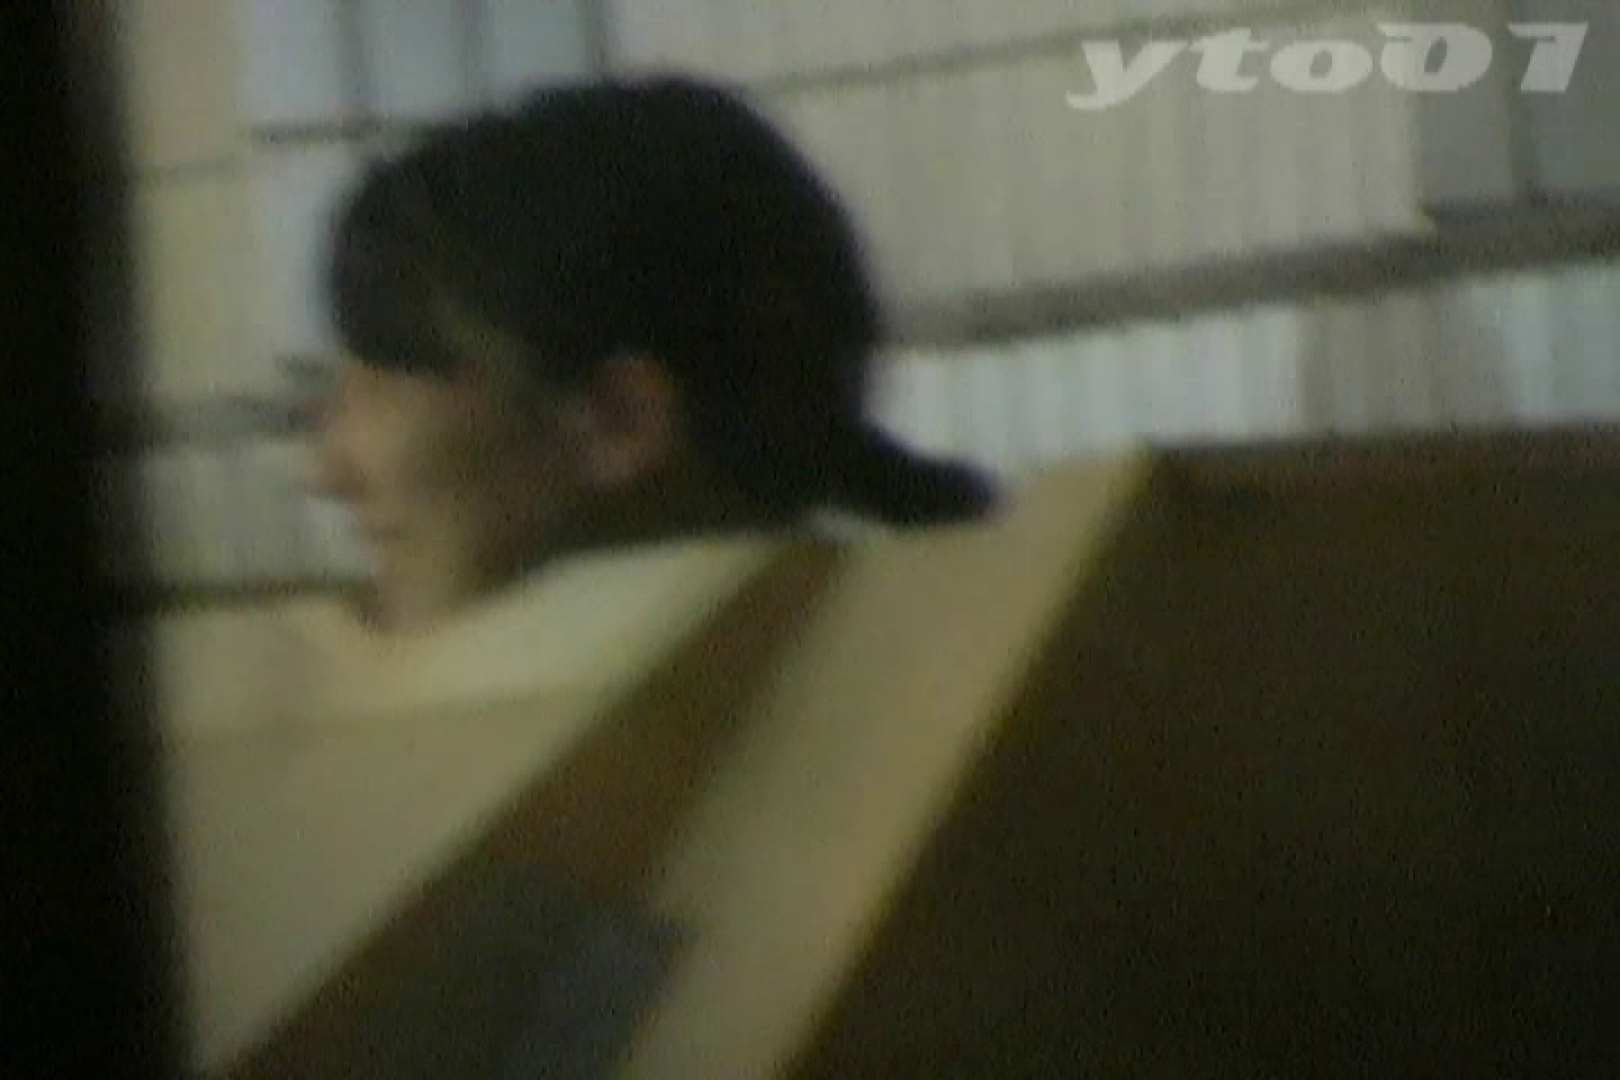 ▲復活限定▲合宿ホテル女風呂盗撮 Vol.06 女風呂 オメコ無修正動画無料 57画像 52